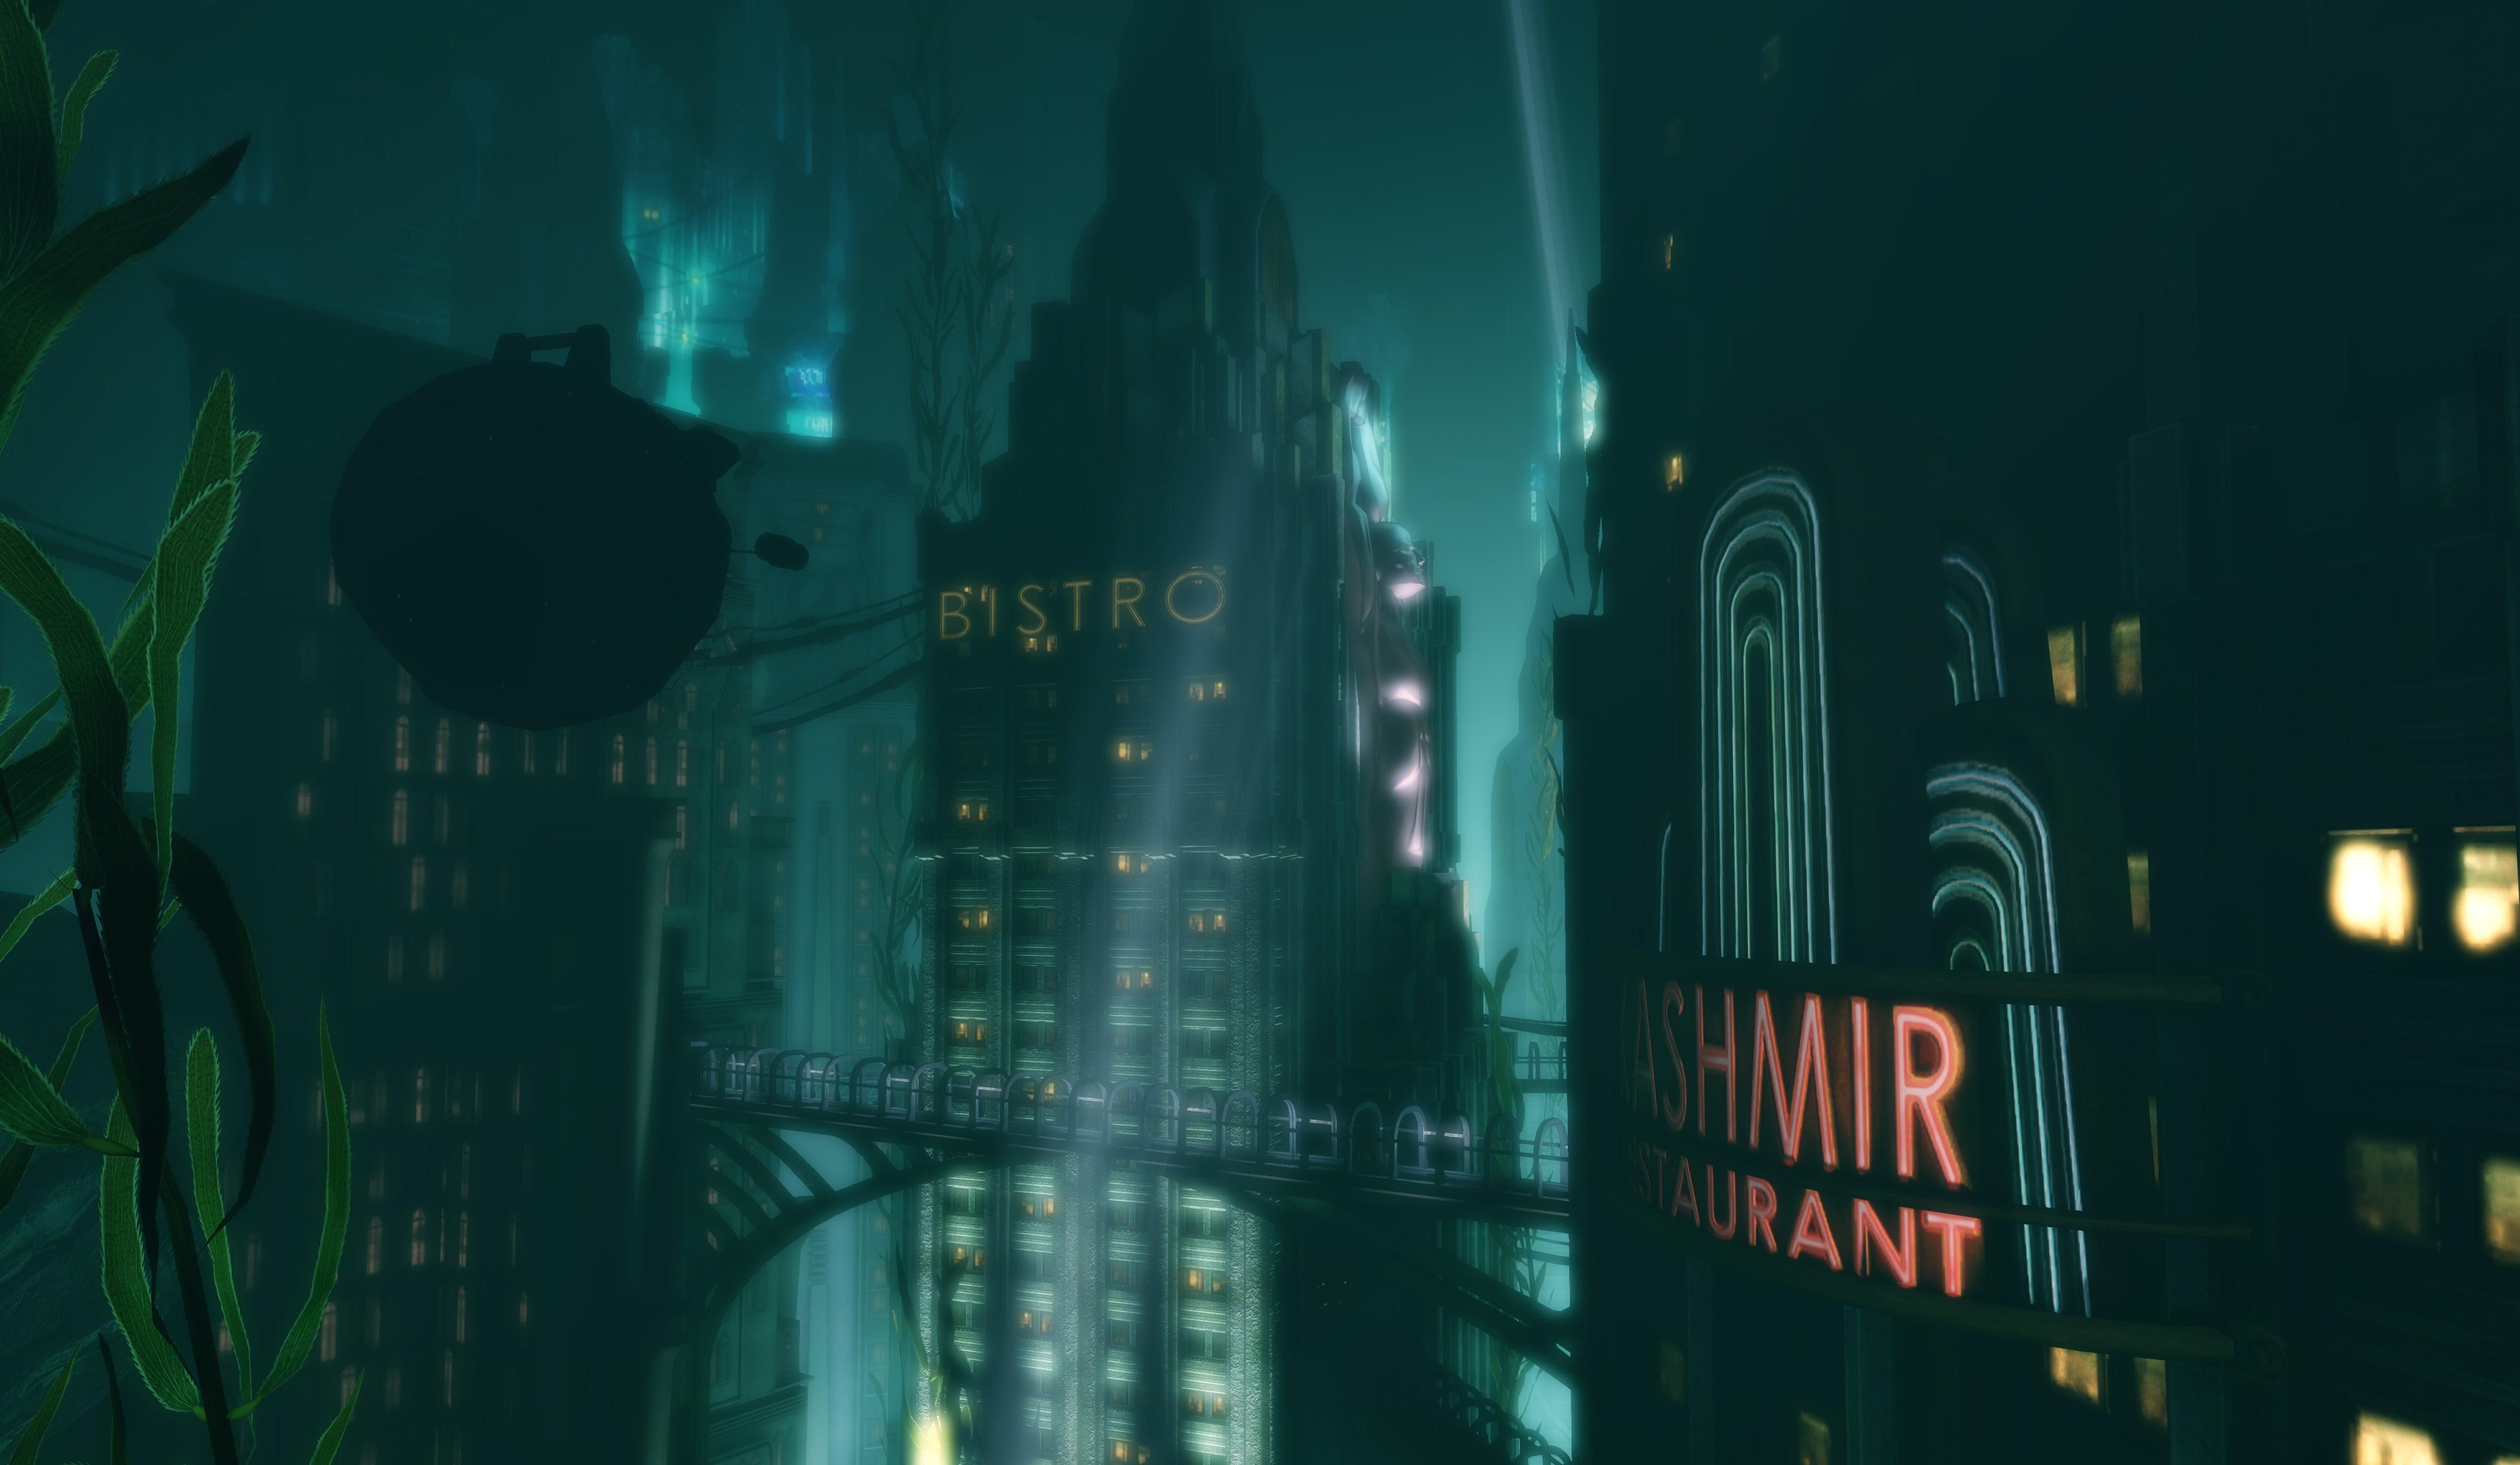 video games night reflection underwater screen shot BioShock submarine Rapture light darkness screenshot computer wallpaper special effects 36722